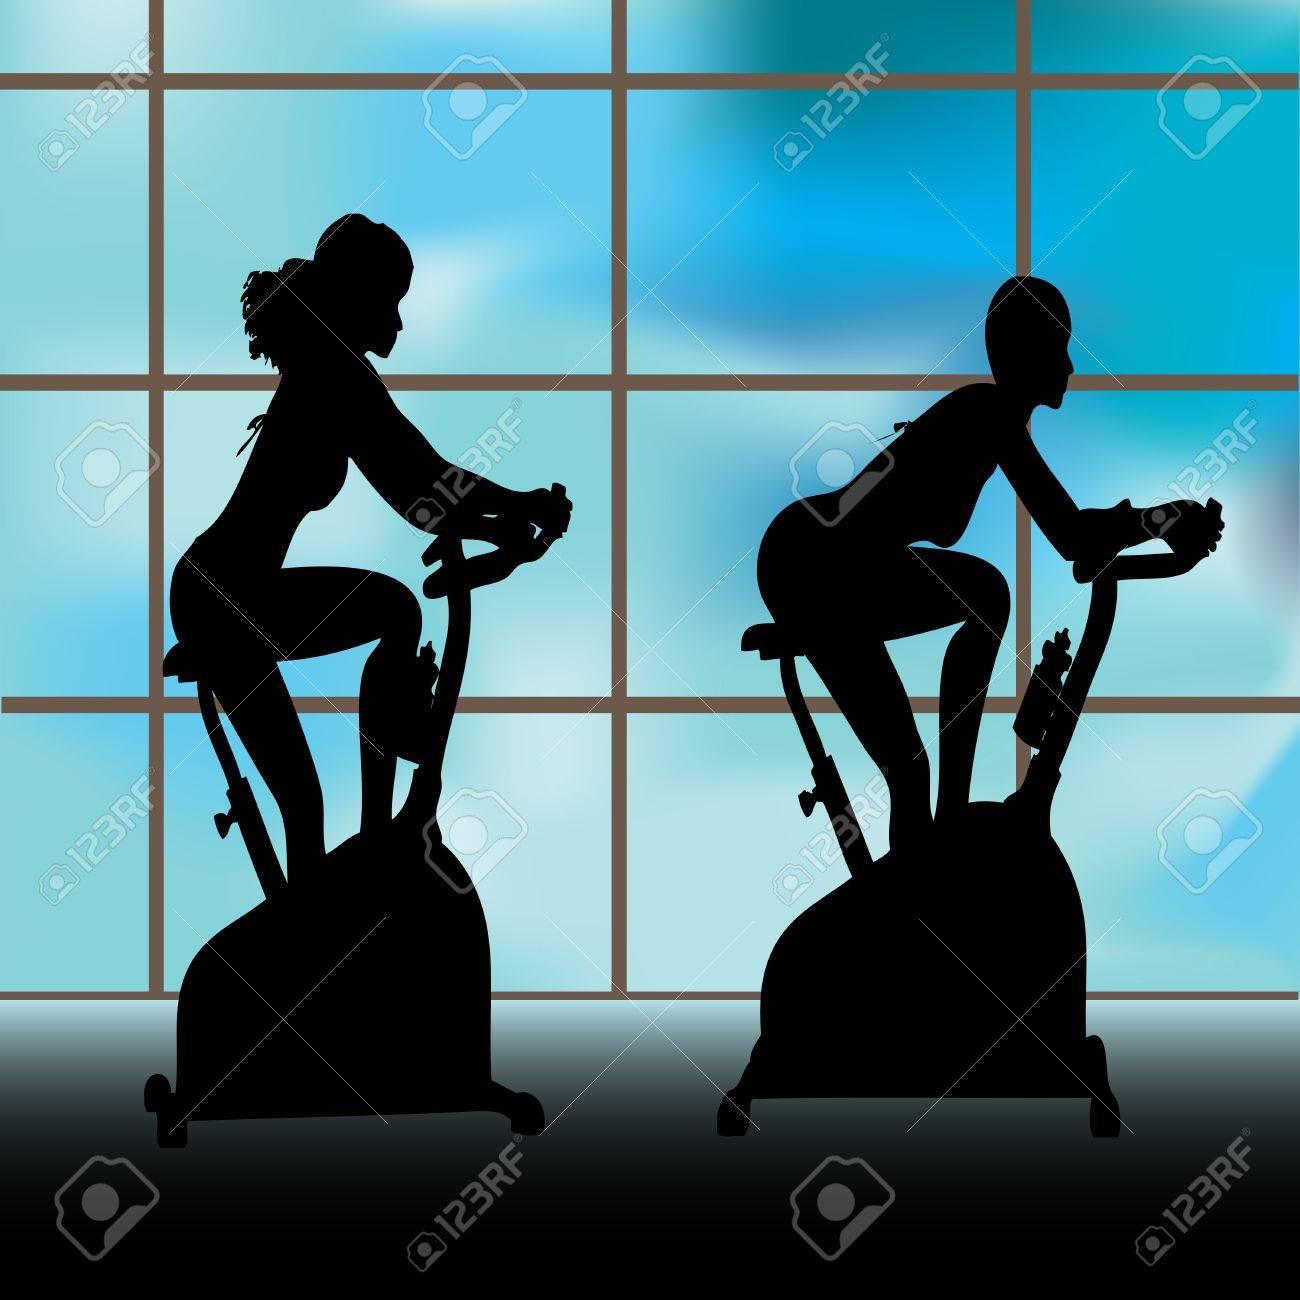 Exercise Window Stock Vector - 9337019